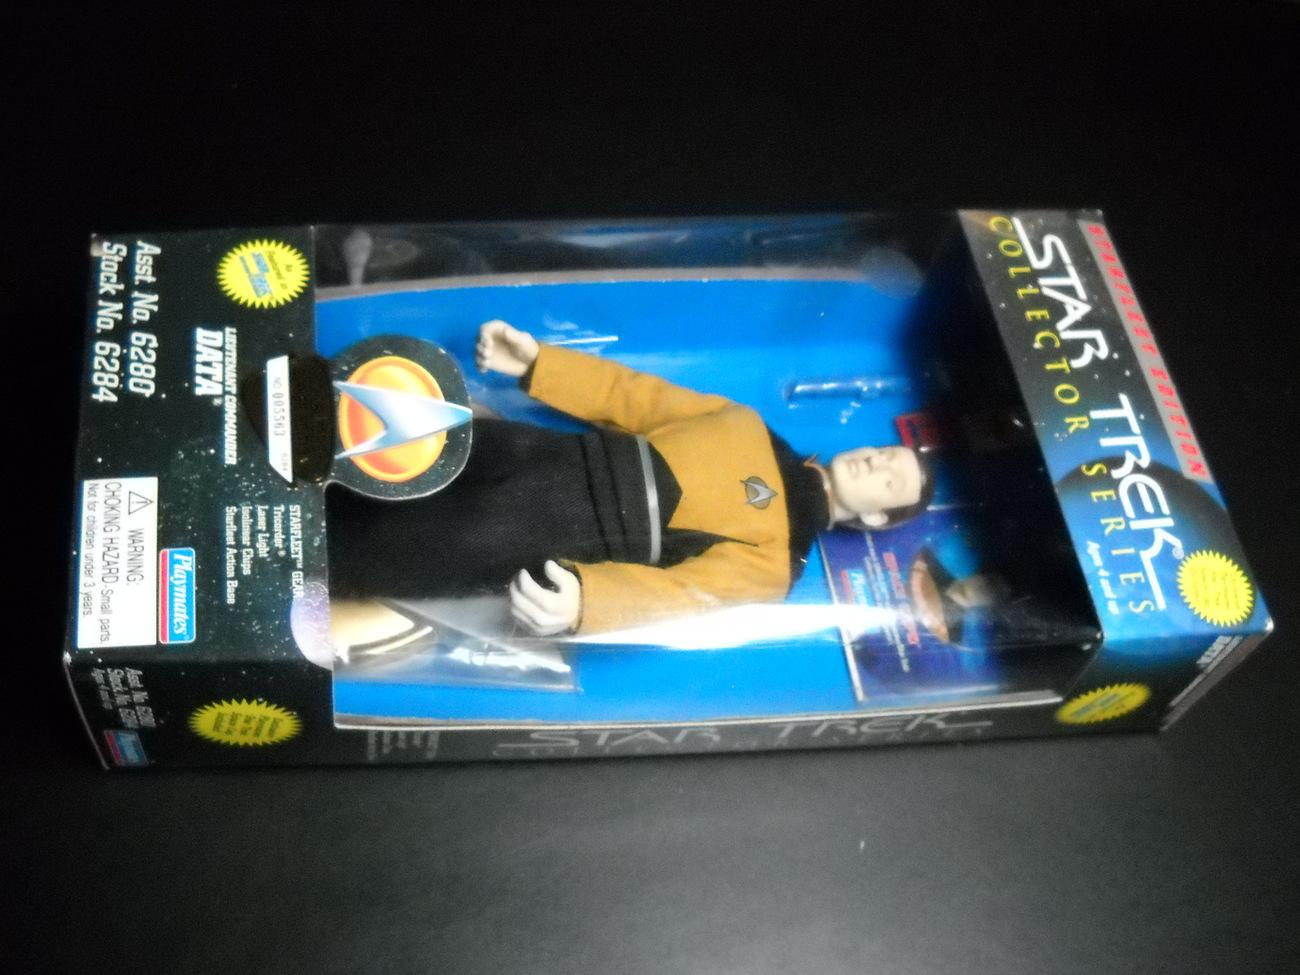 Toy star trek playmates starfleet edition lieutenant commander data 1995 9 inch boxed sealed 01